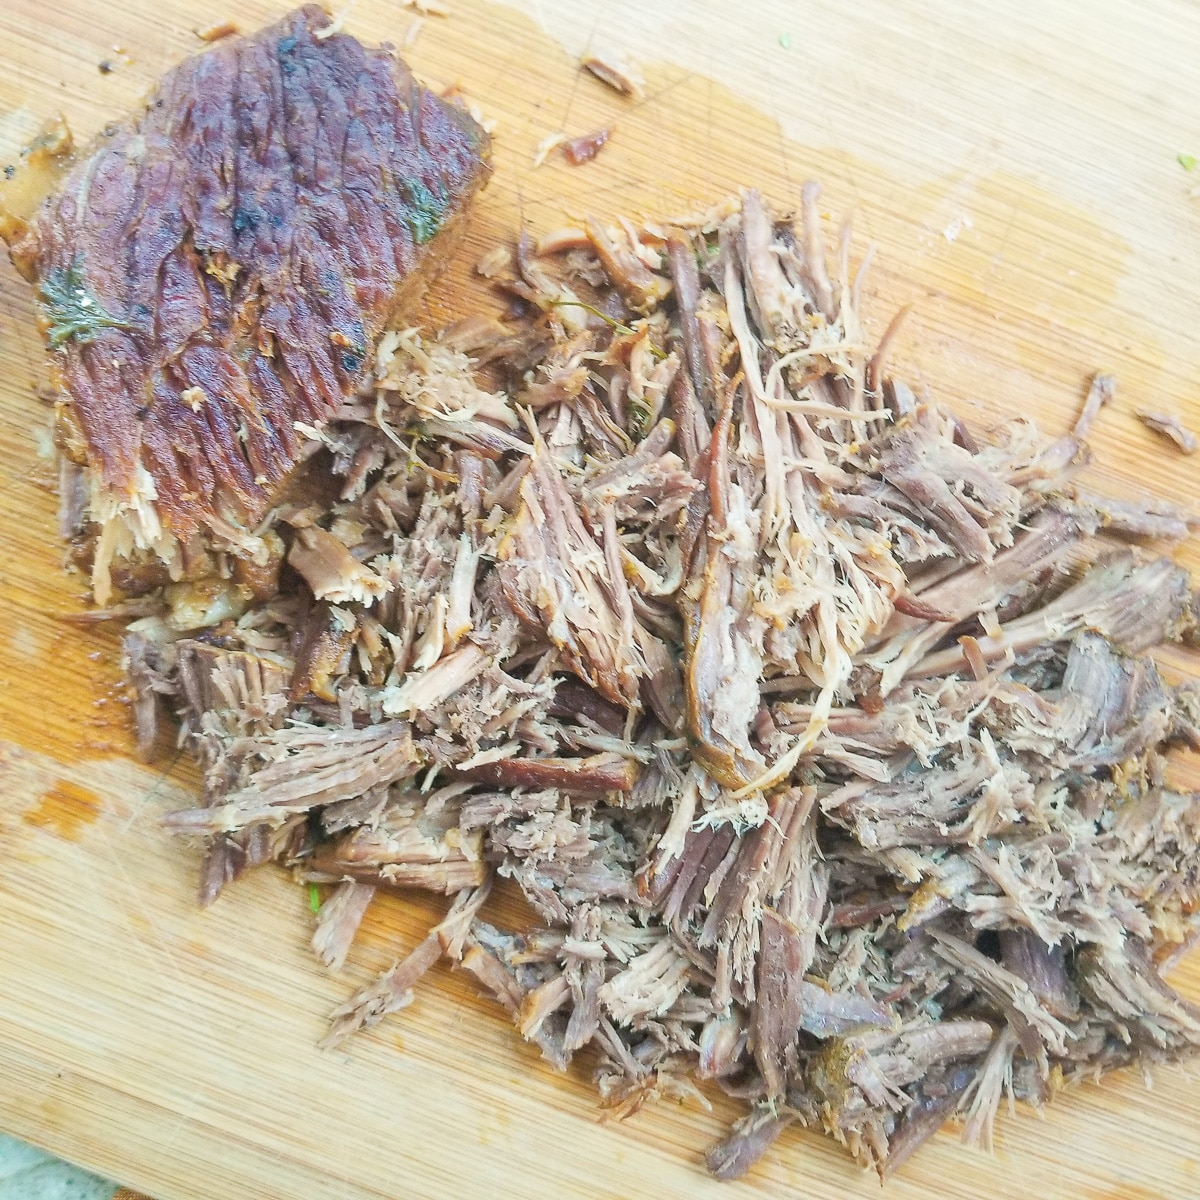 Beef on a wooden cutting board, shredded to make carne deshebrada.